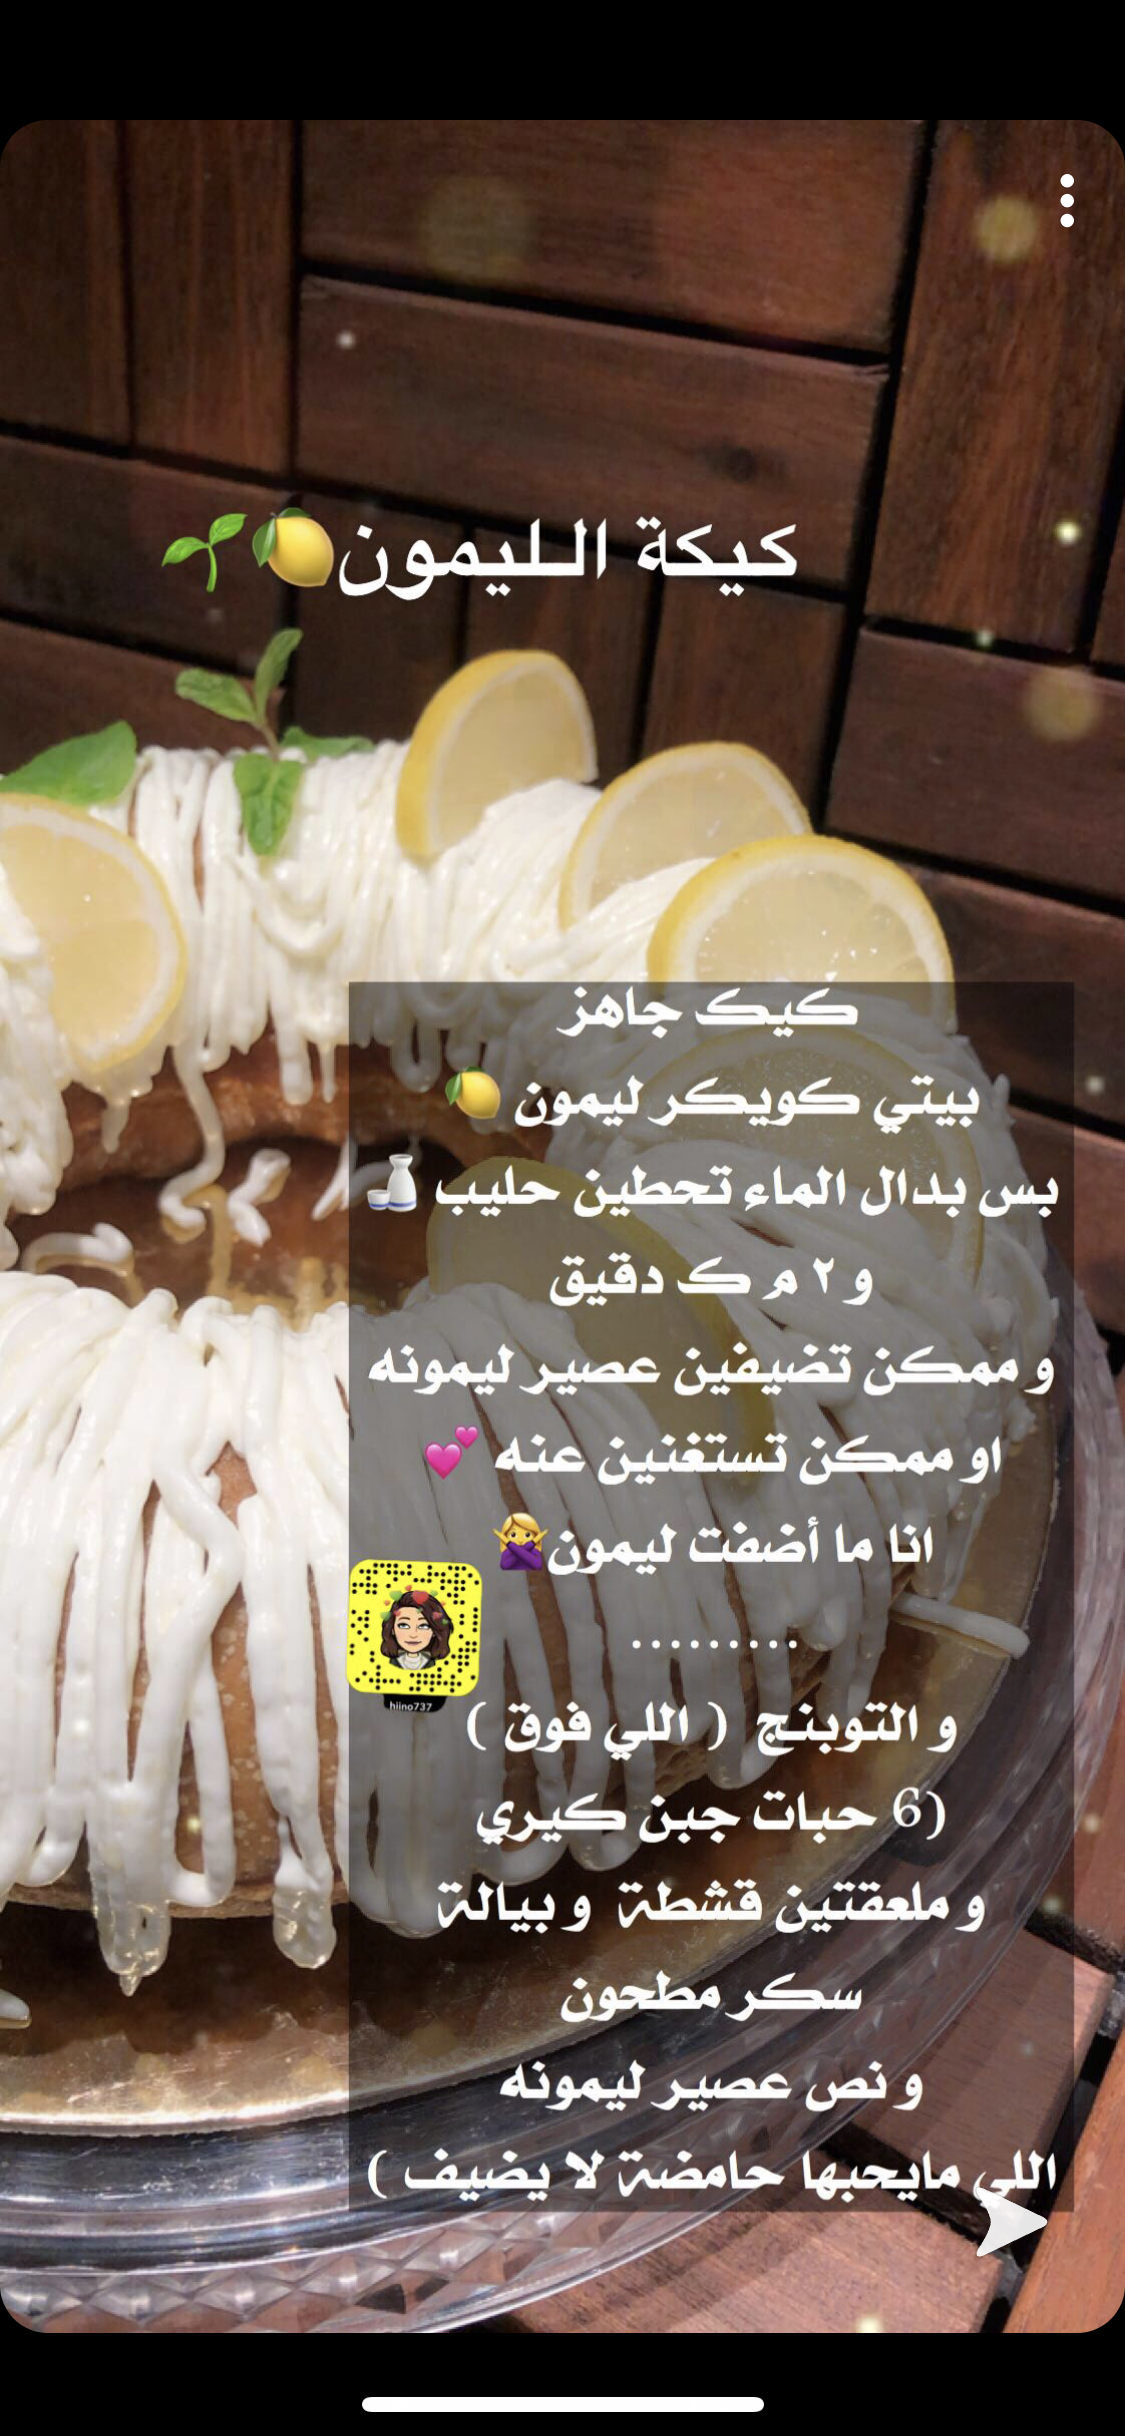 Snap Hiino737 Arabic Food Cake Mix Recipes Food And Drink